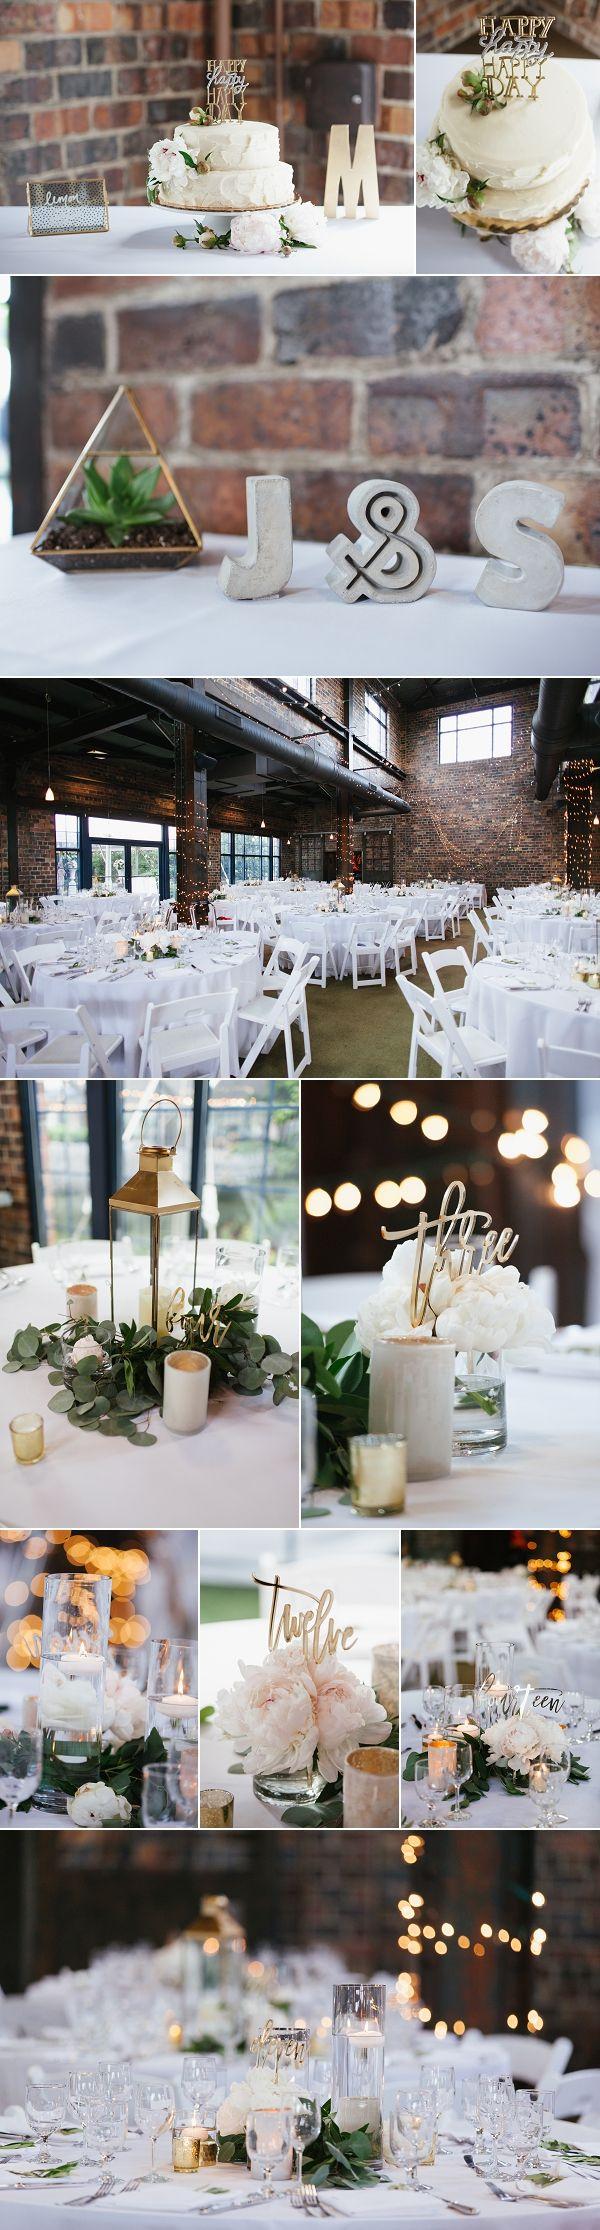 Jessica Miller Photography Dock 580 rustic columbus oh wedding